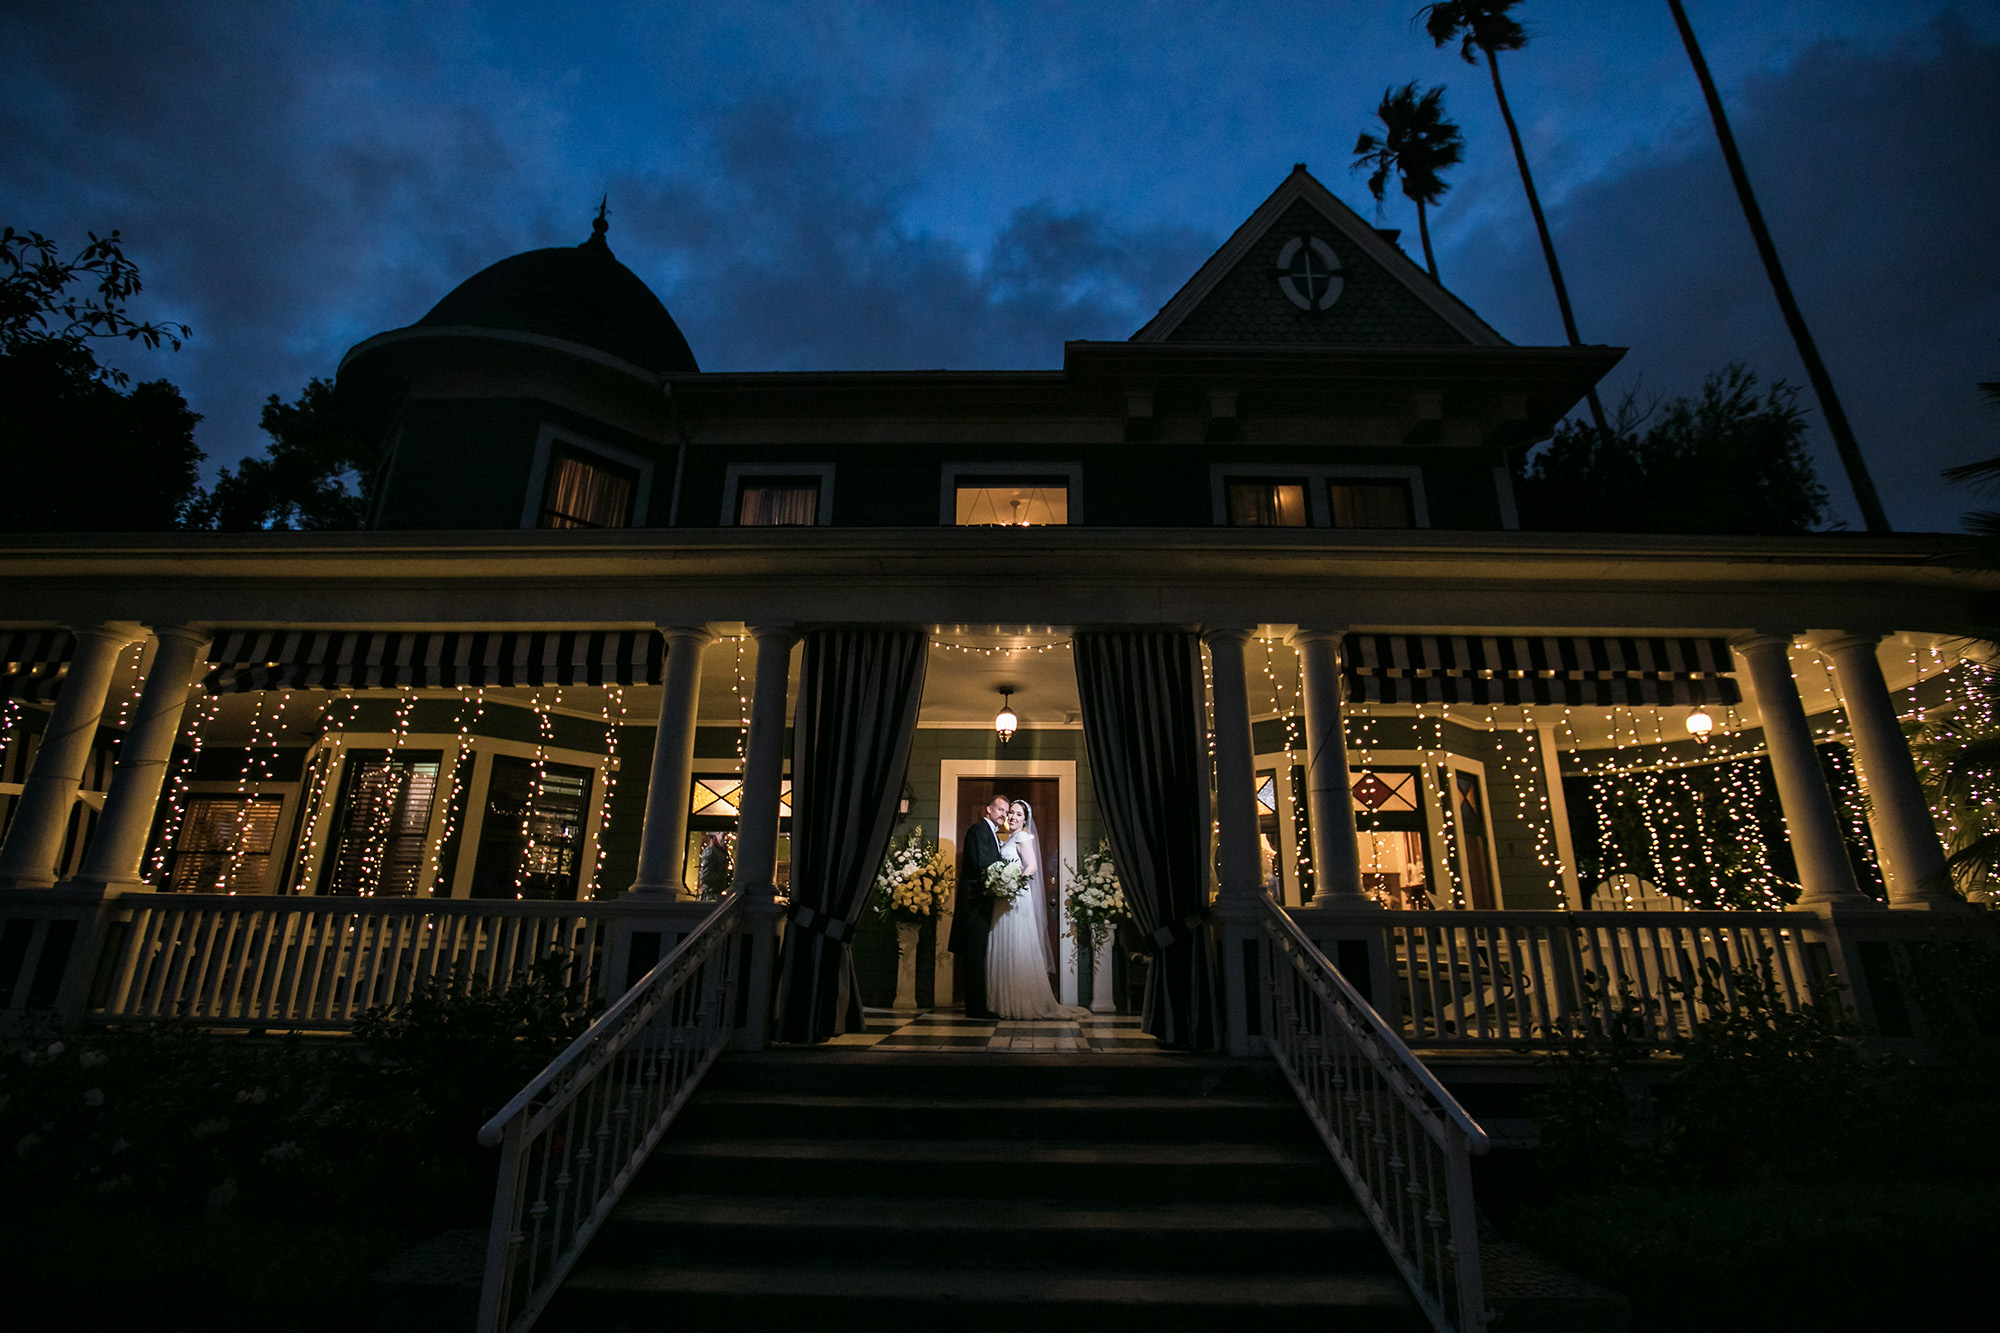 vintage-inspired-christmas-house-wedding-carrie-vines-121.jpg